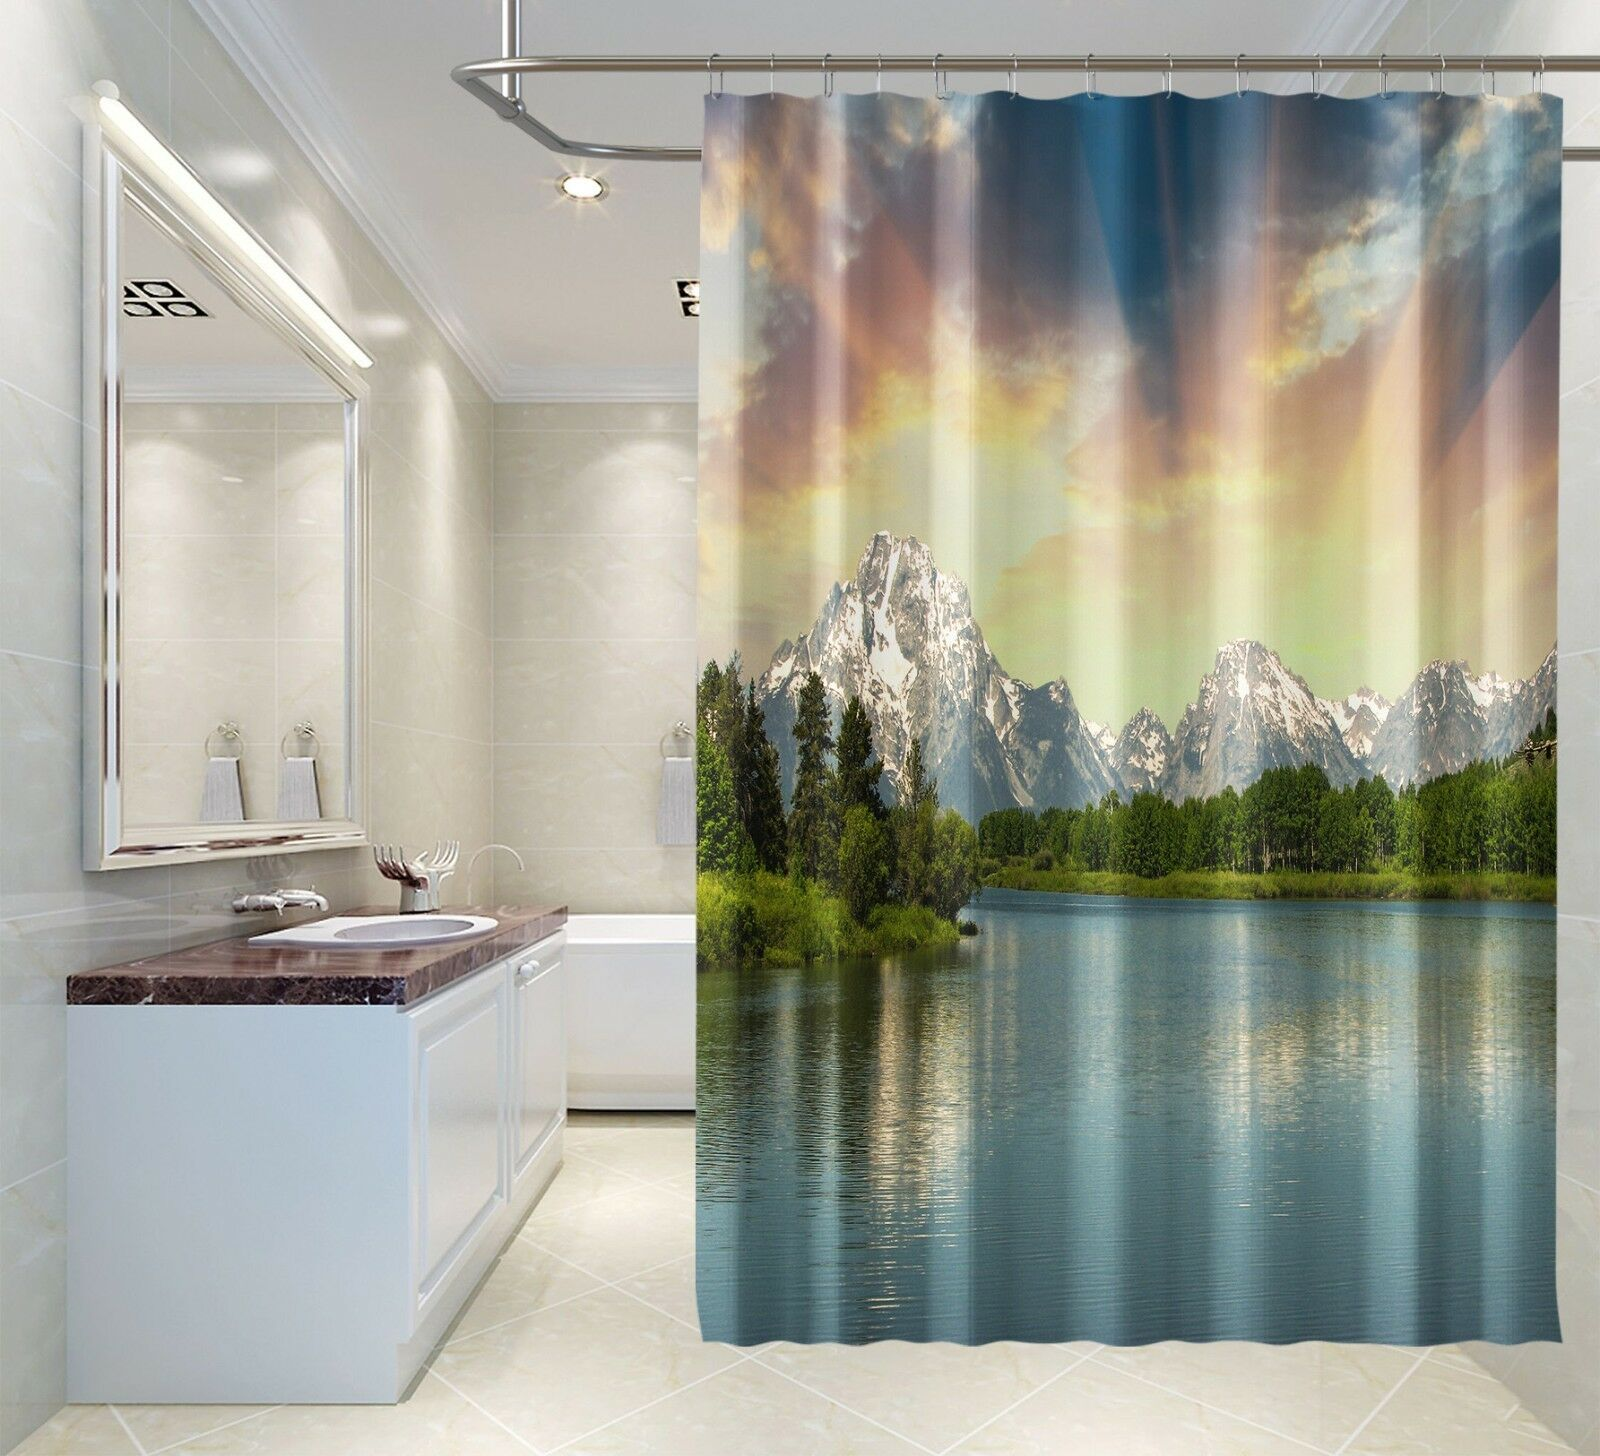 3D Mountain Lake 12 Shower Curtain Curtain Curtain Waterproof Fiber Bathroom Home Windows Toilet d54fe3